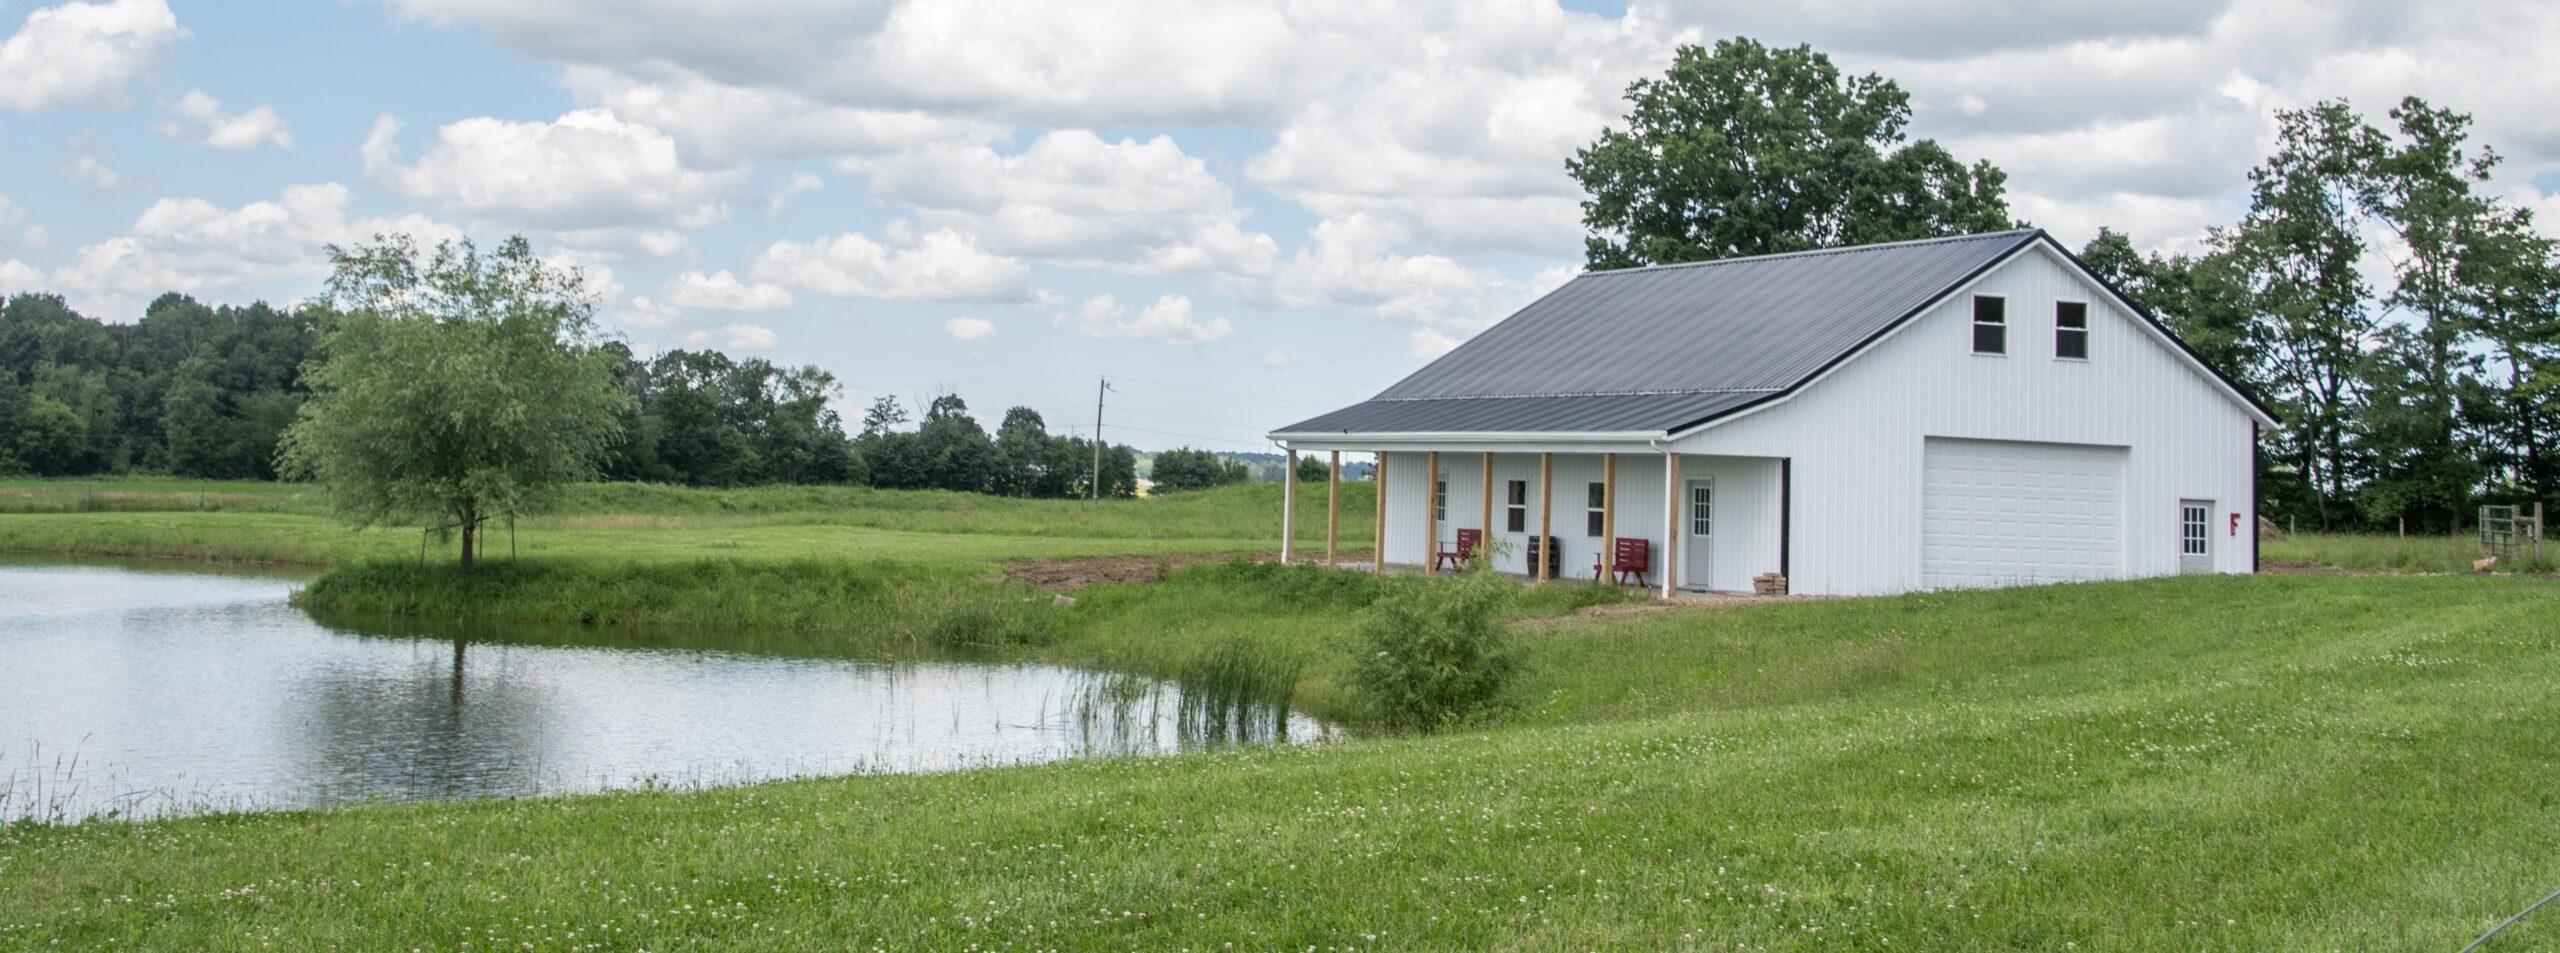 Pole Barn - Small White with Porch